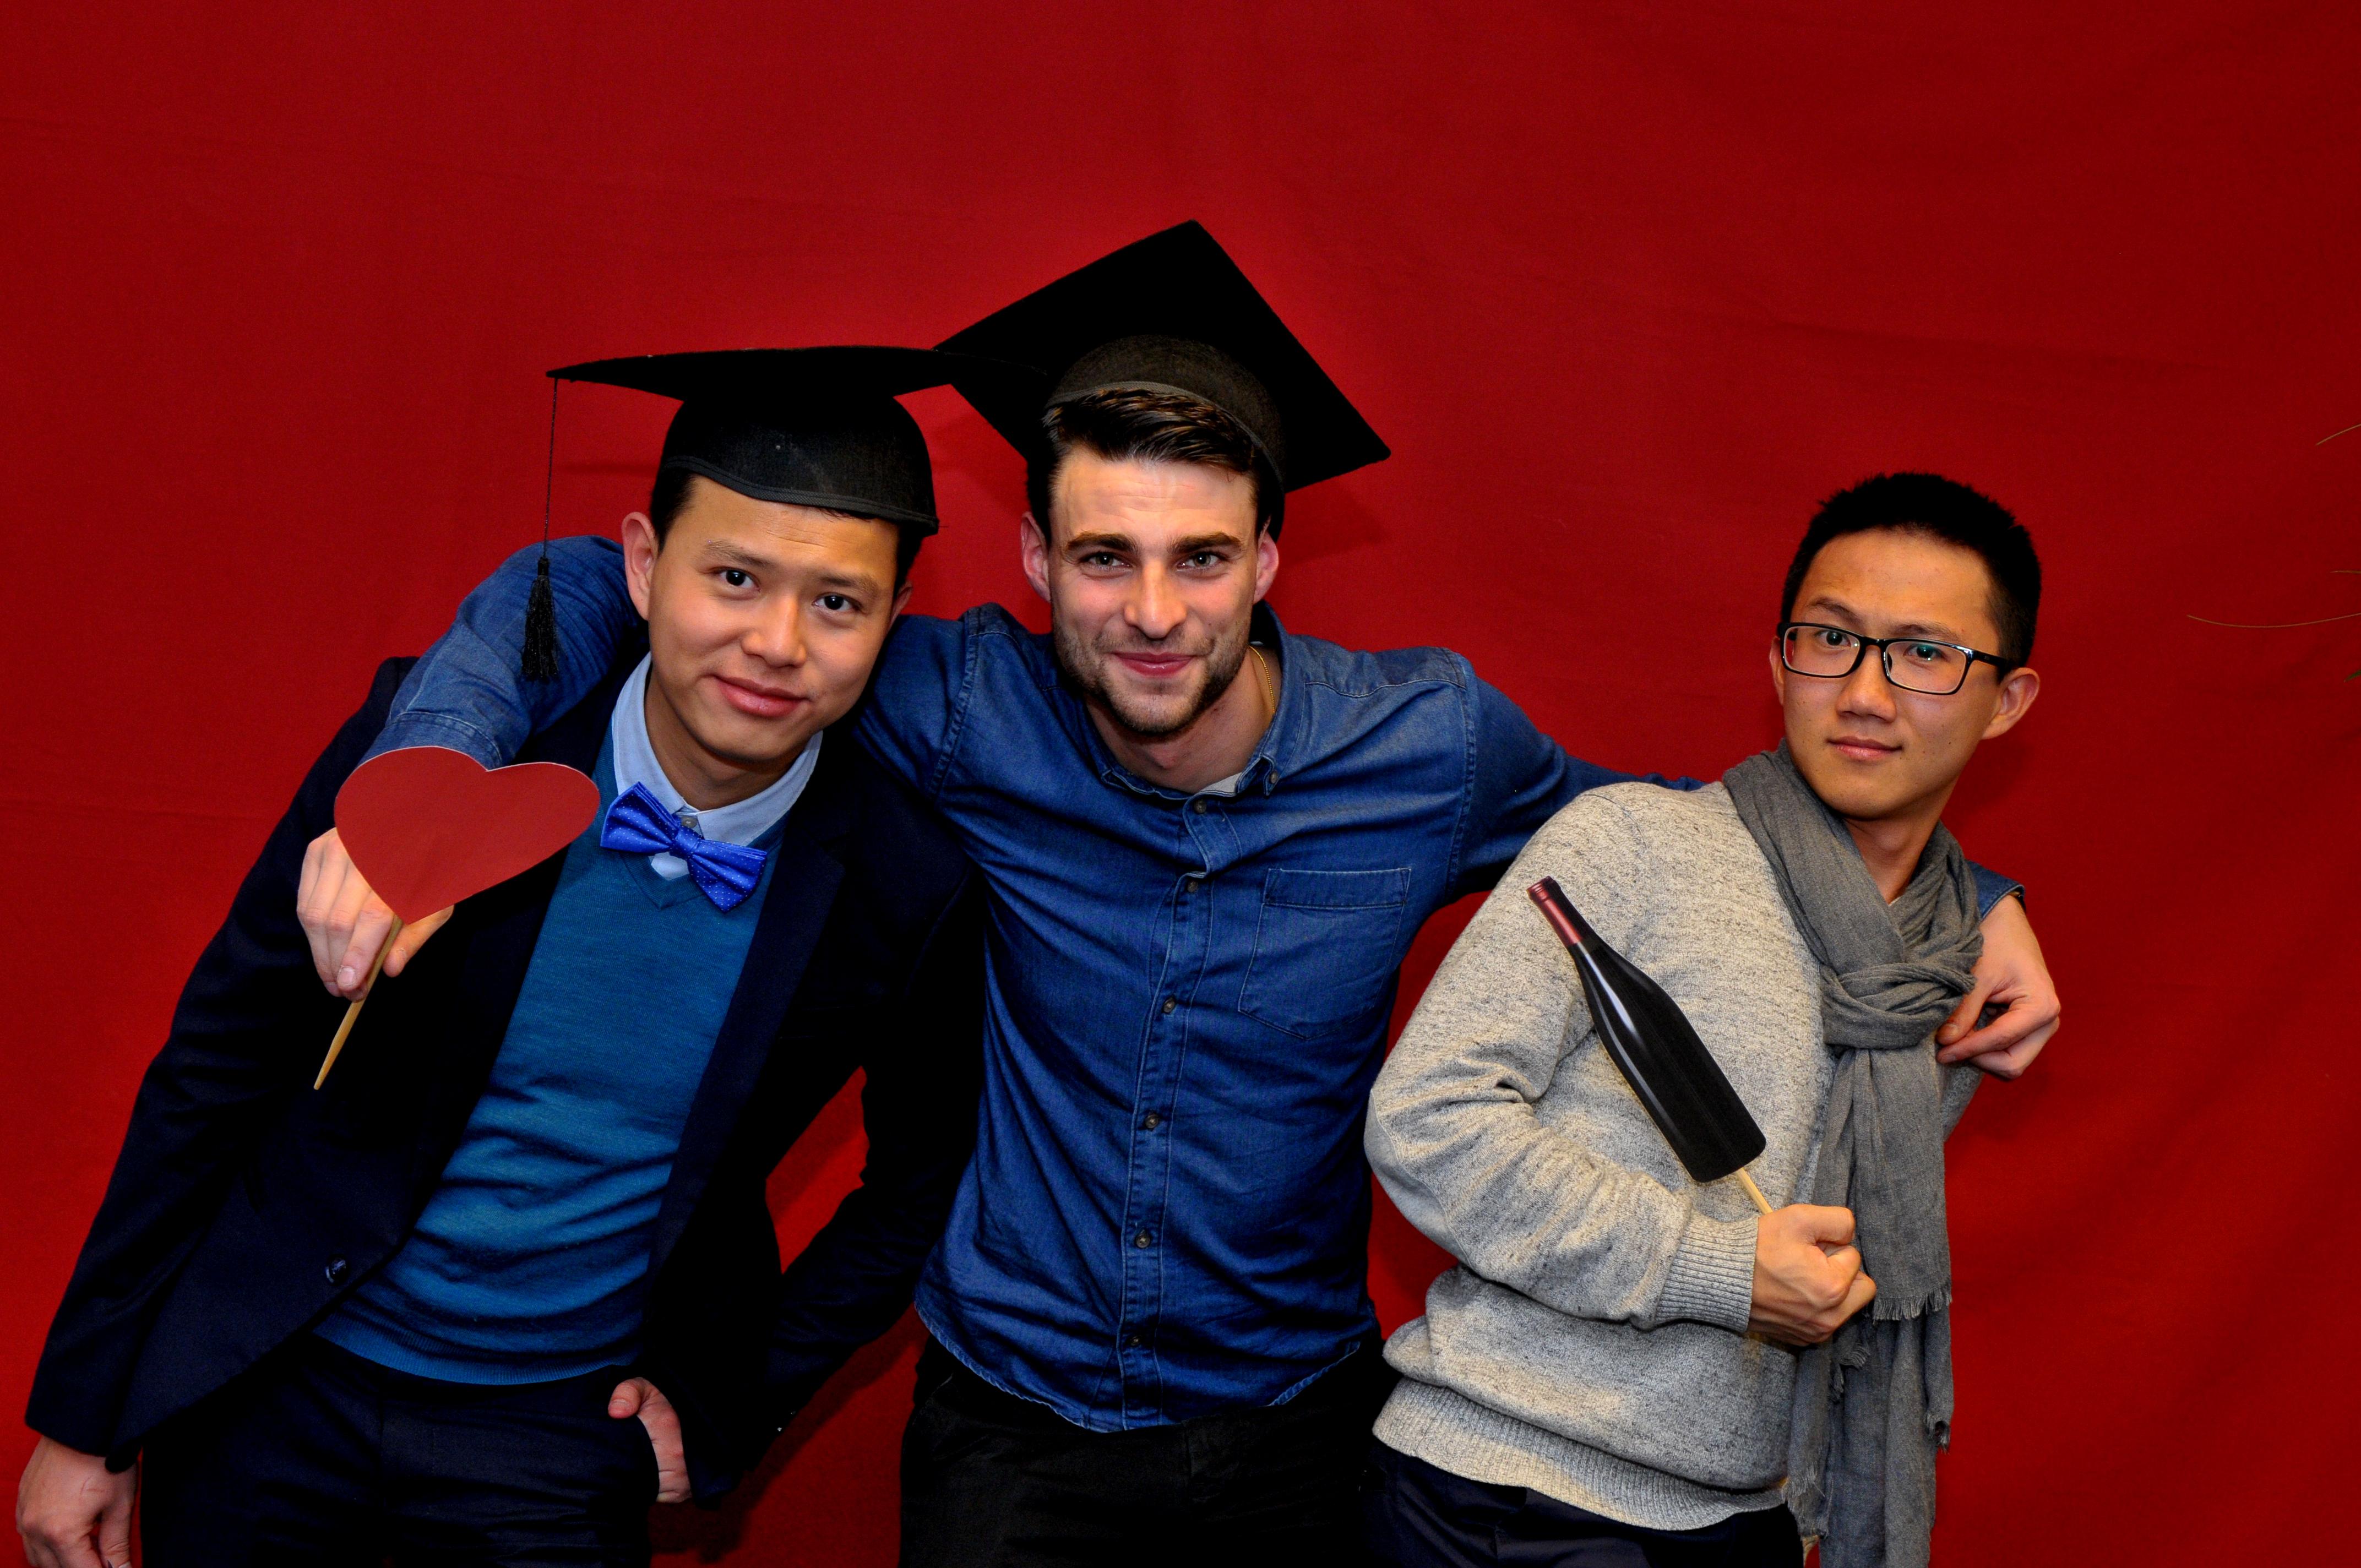 Remise des diplomes120